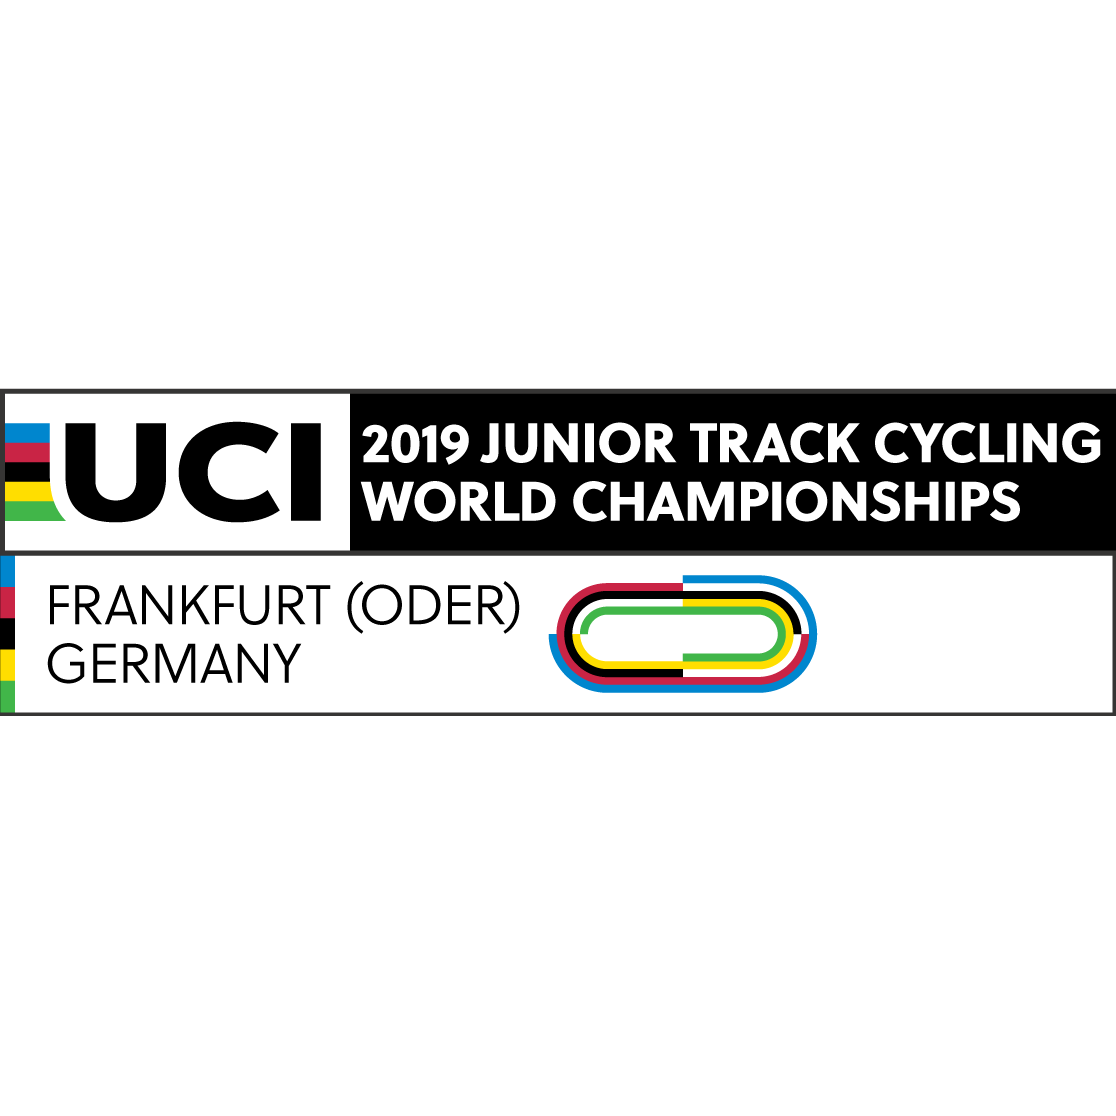 2019 UCI Track Cycling Junior World Championships